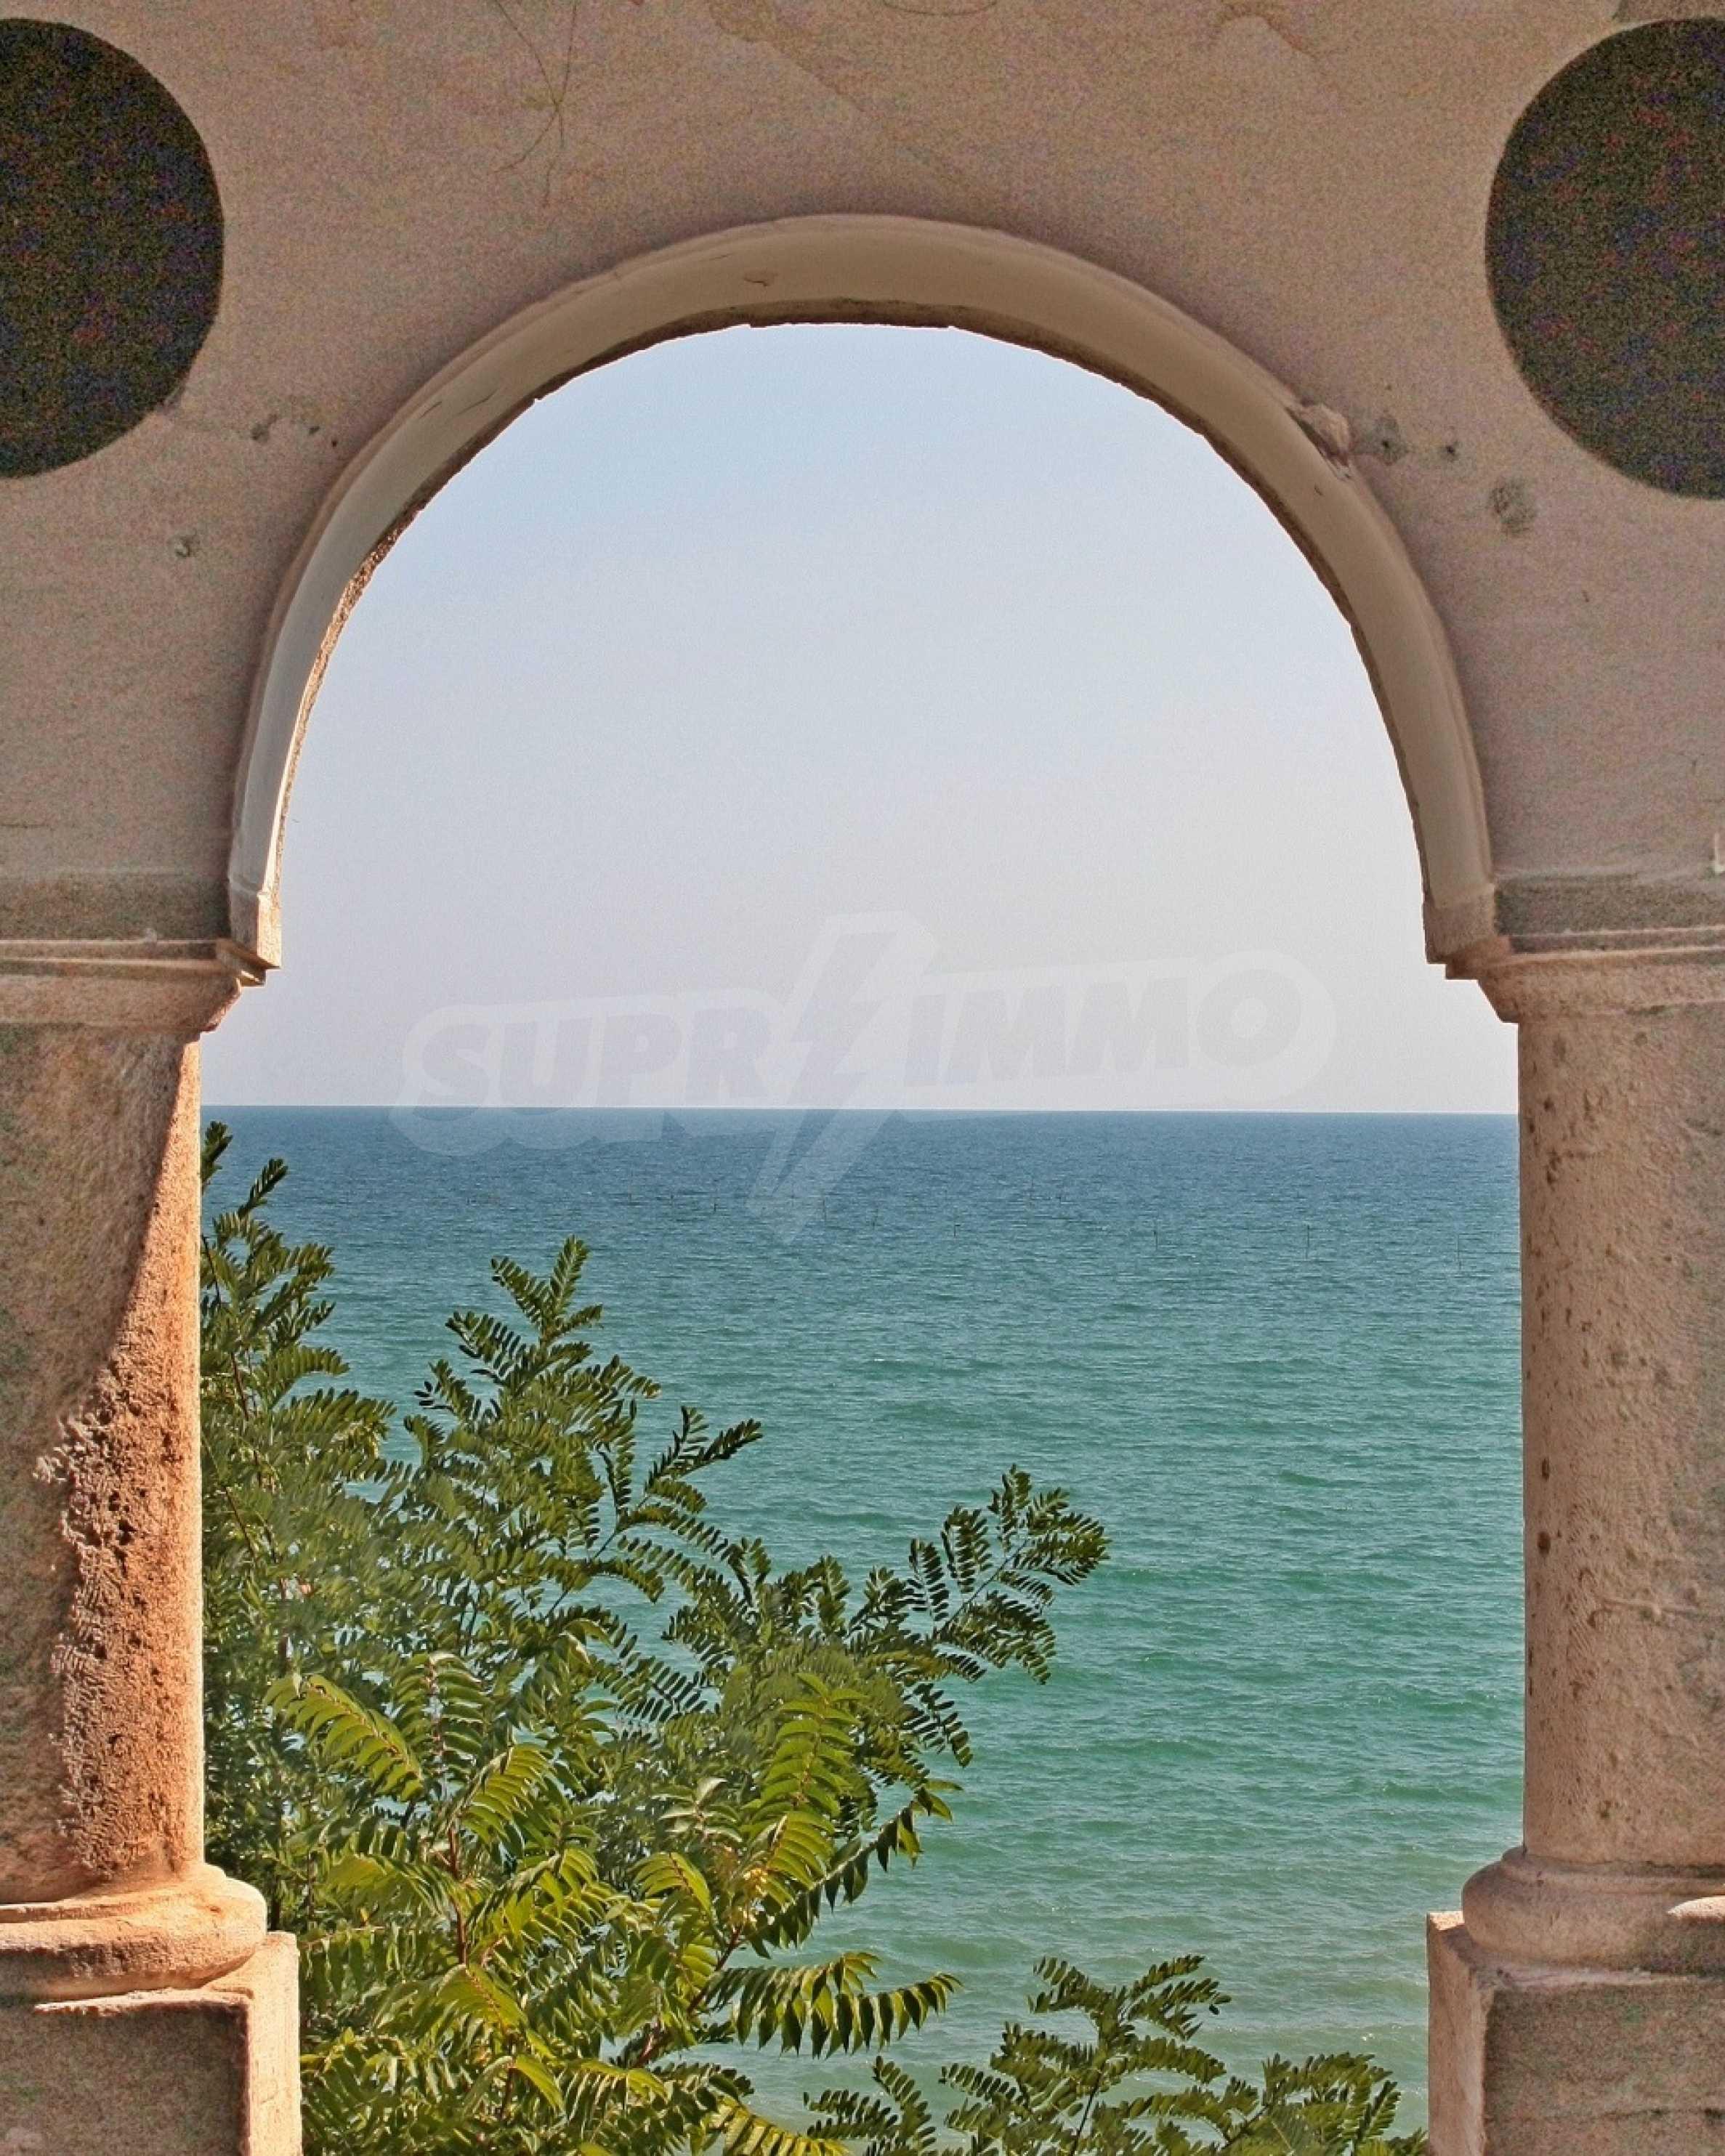 Villa Storck - an aristocratic mansion on the beach 16